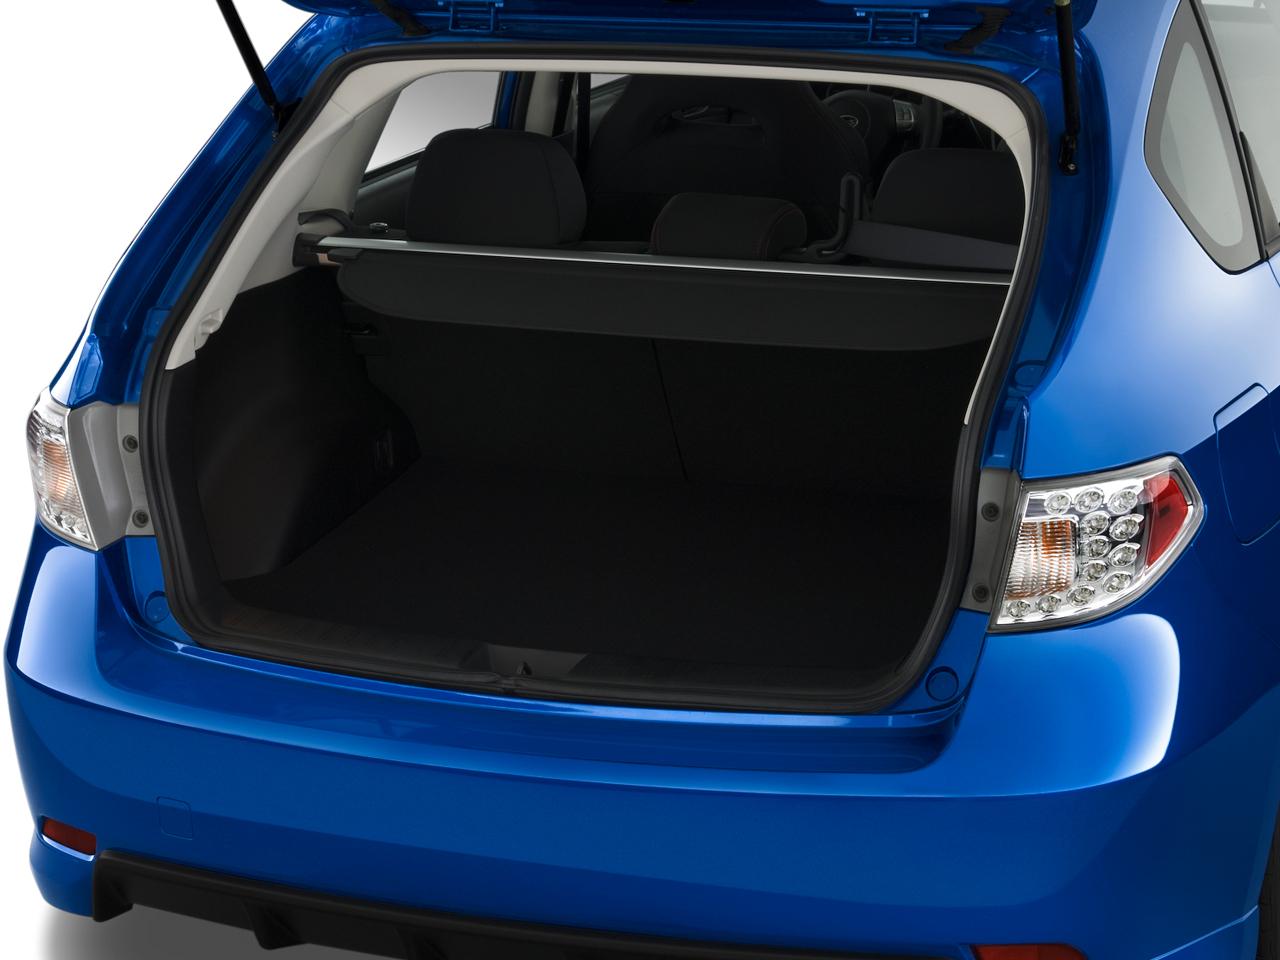 Toyota Corolla Mpg >> 2009 Subaru Impreza WRX - Subaru Sports Hatchback Review ...